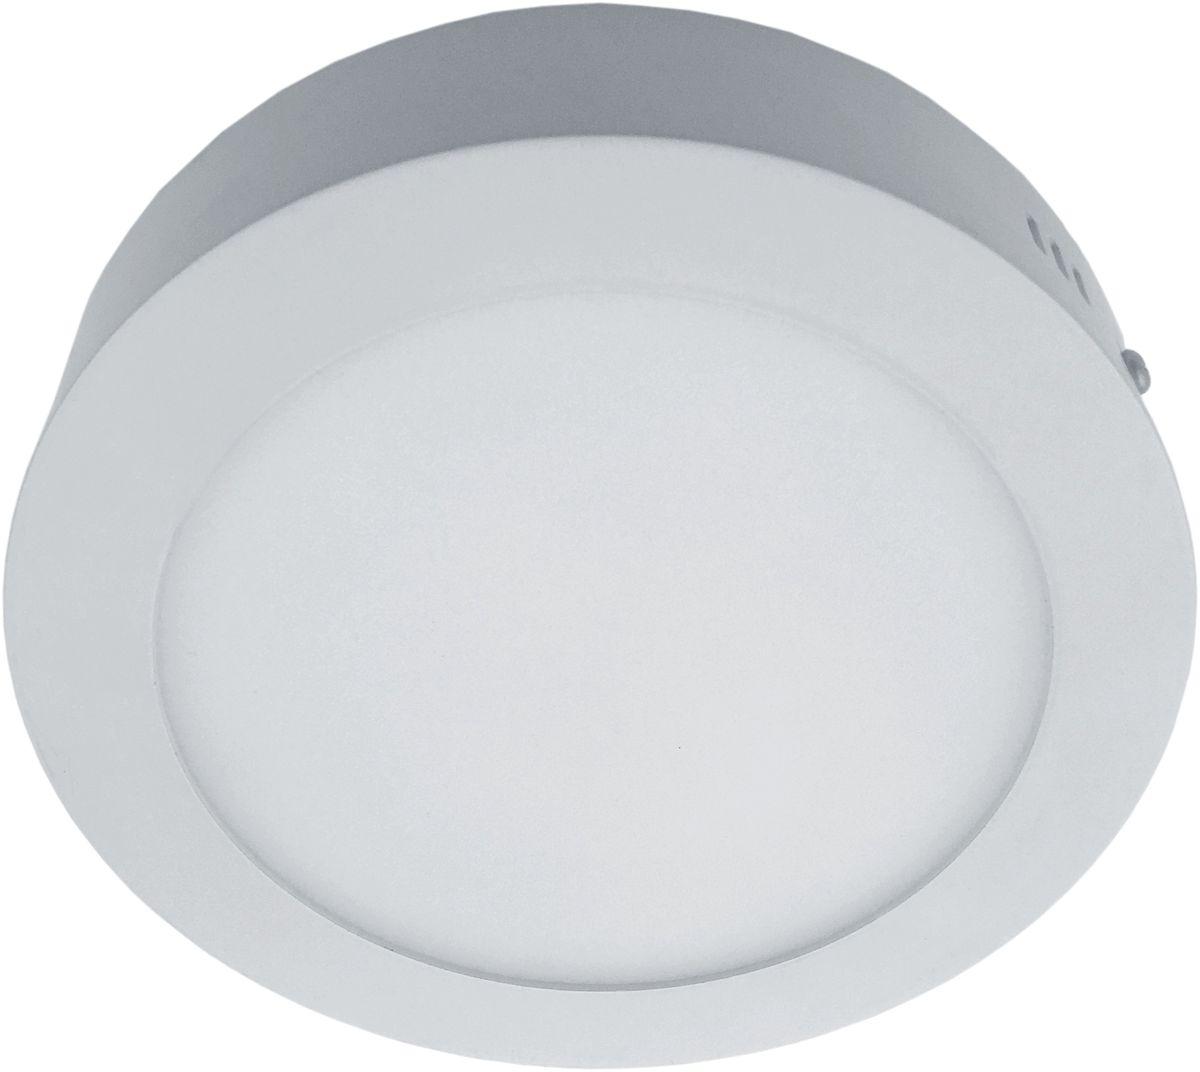 Светильник потолочный Arte Lamp ANGOLO A3008PL-1WHA3008PL-1WH